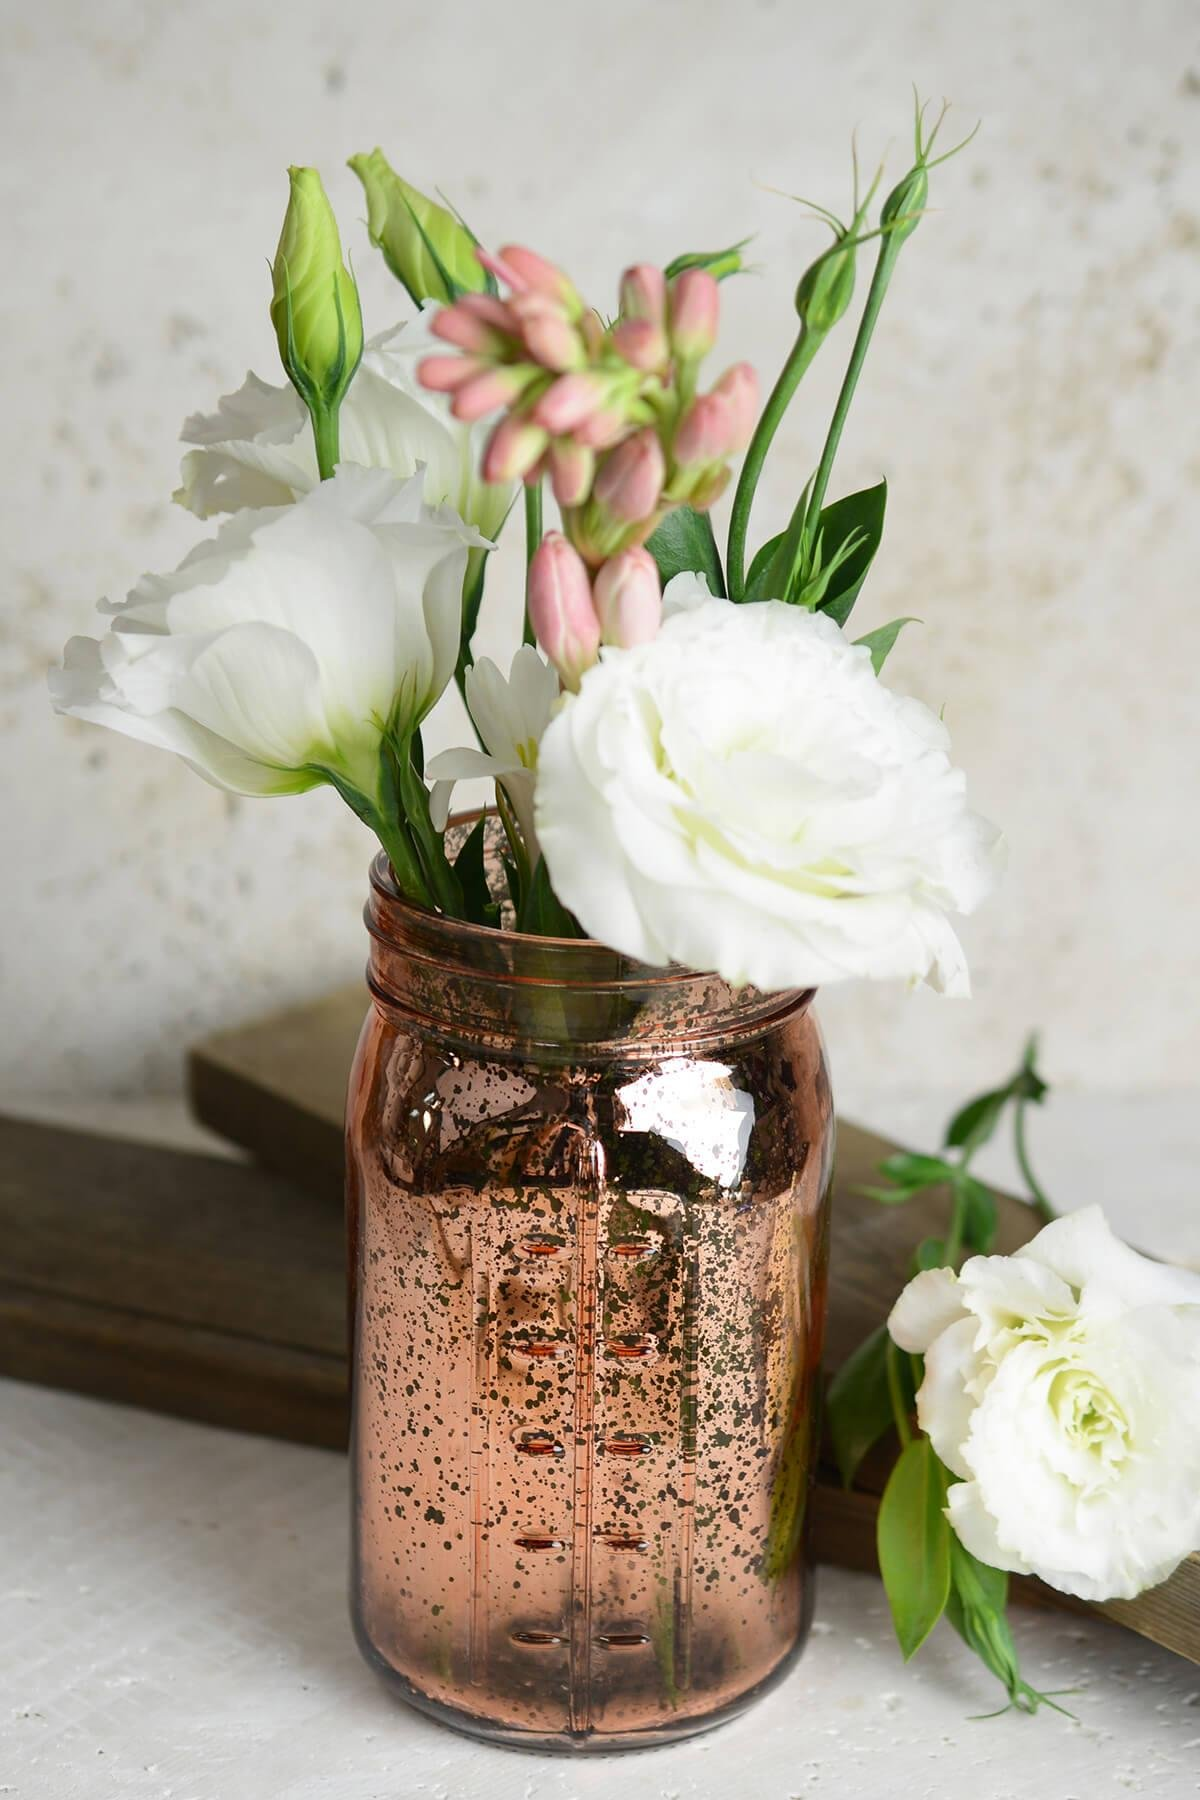 Richland Mason Jar Pink Rose Gold Mercury Glass Set of 12